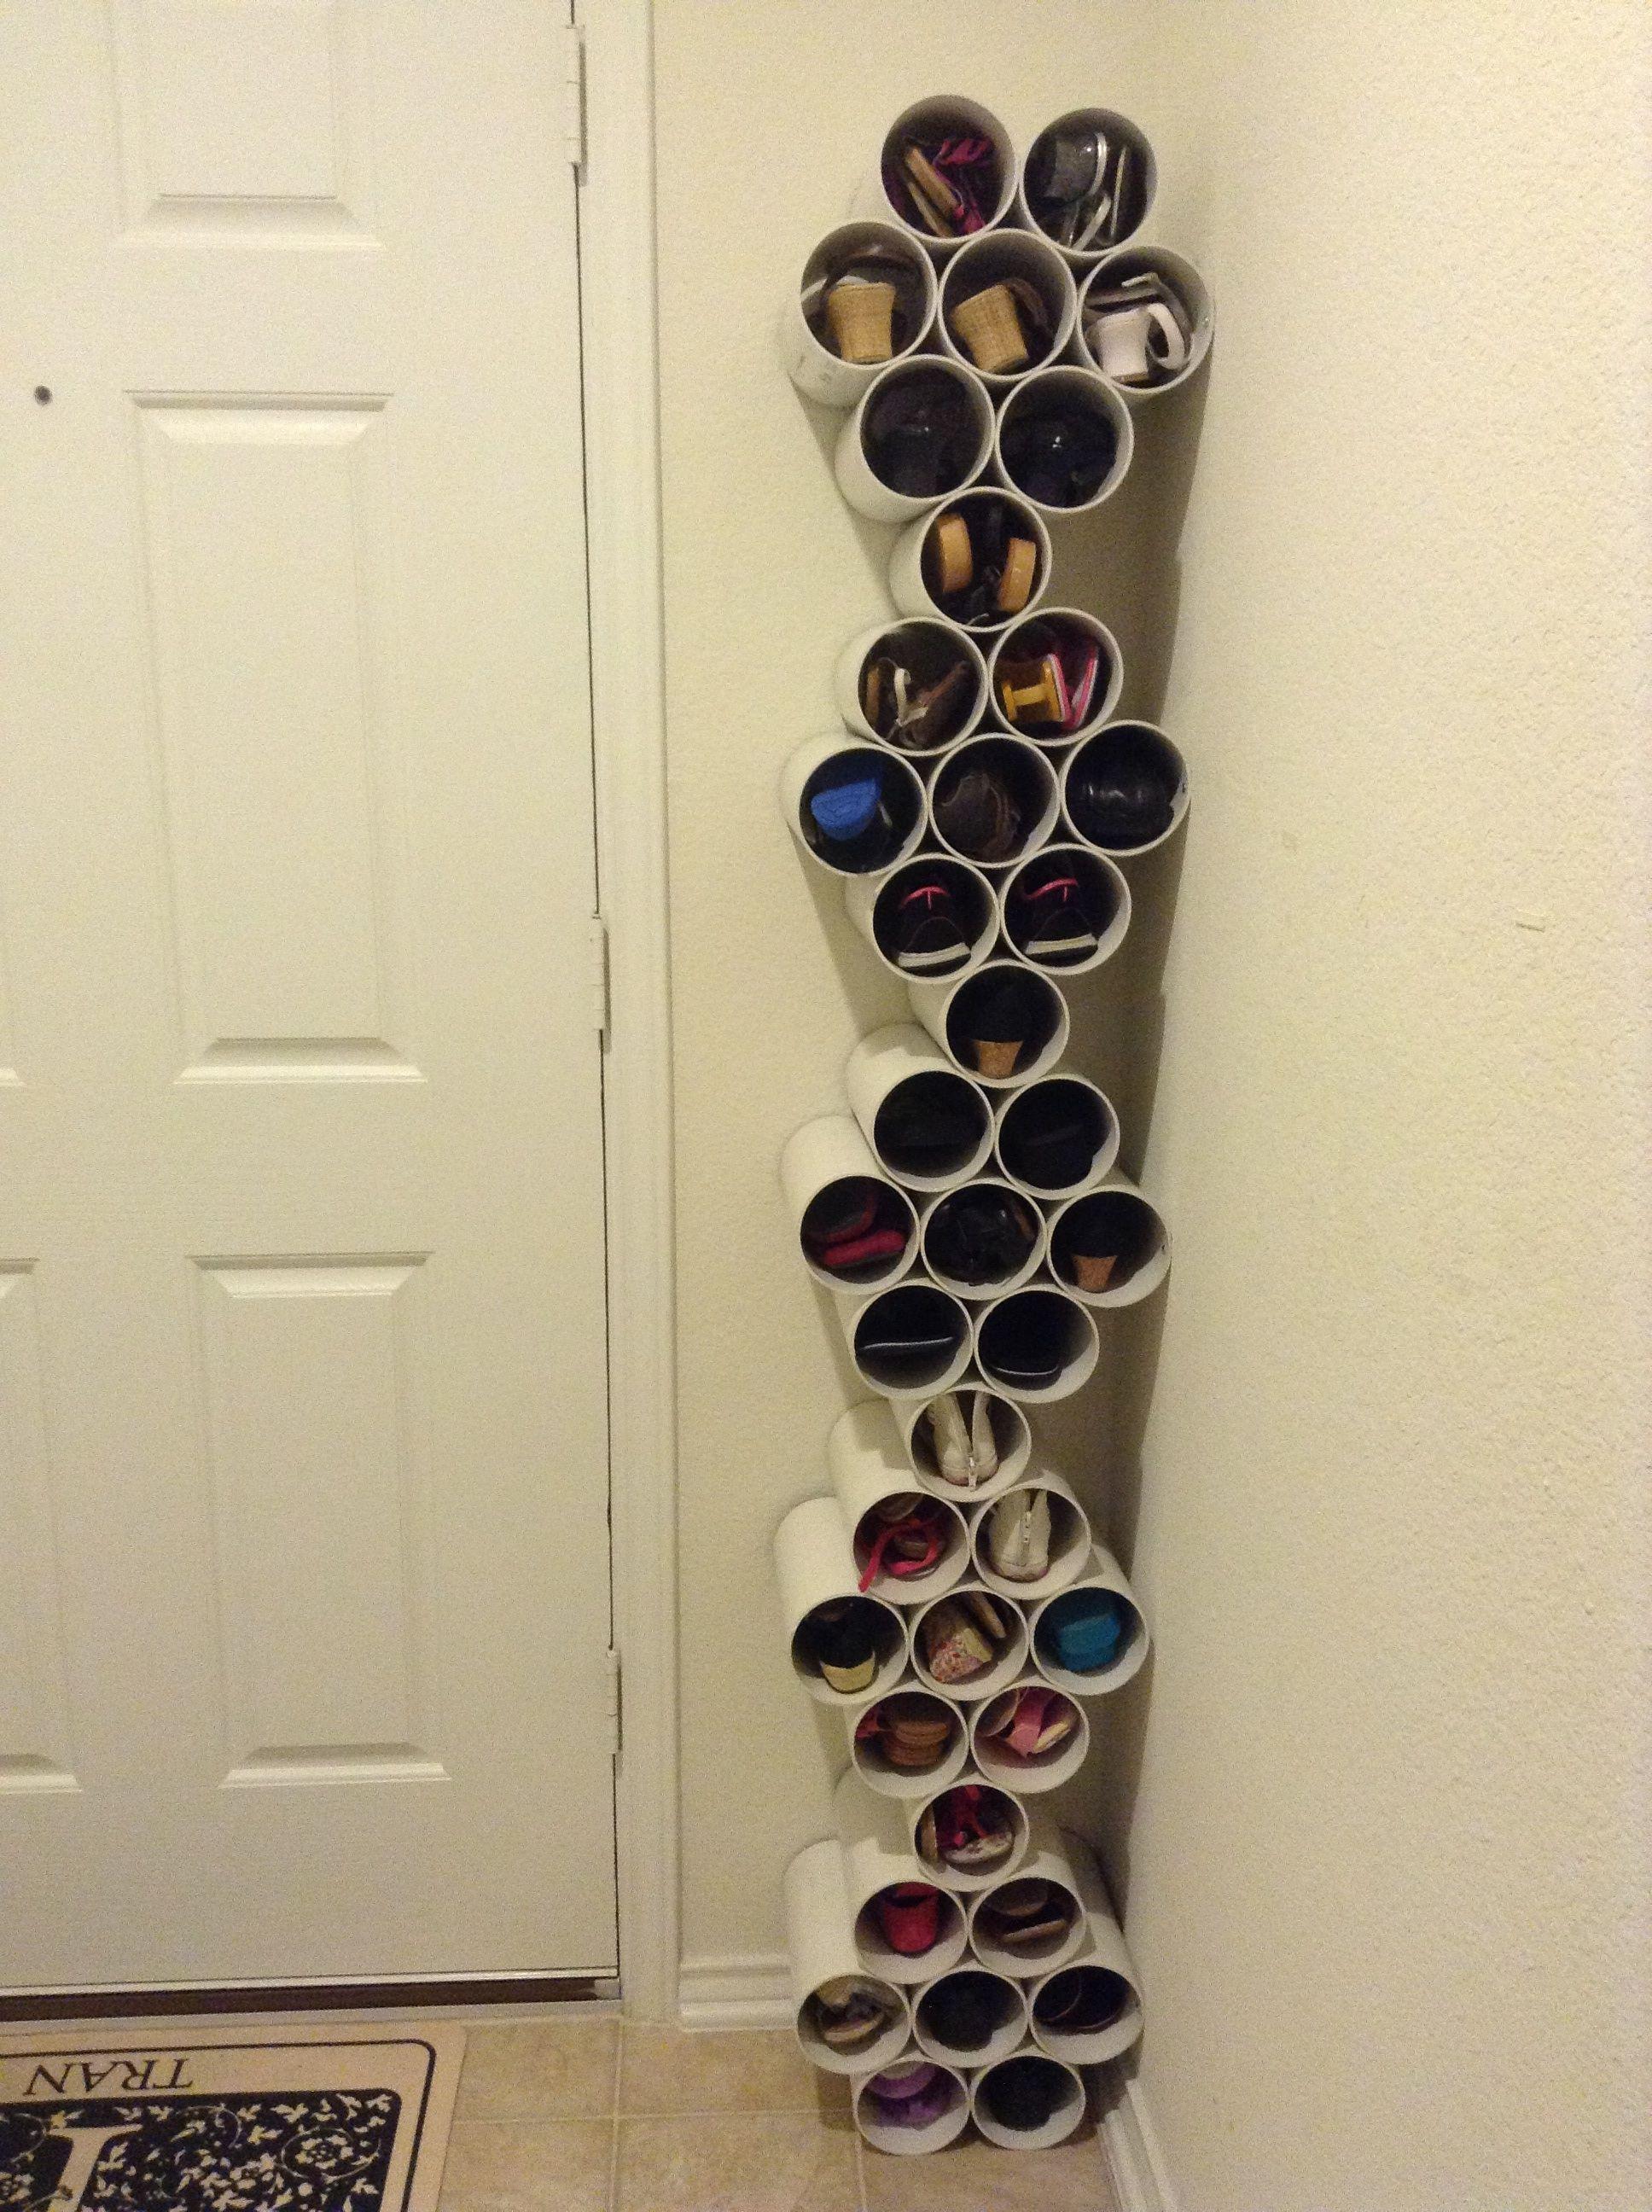 PVC pipe cement glue Shoe rack Pinterest